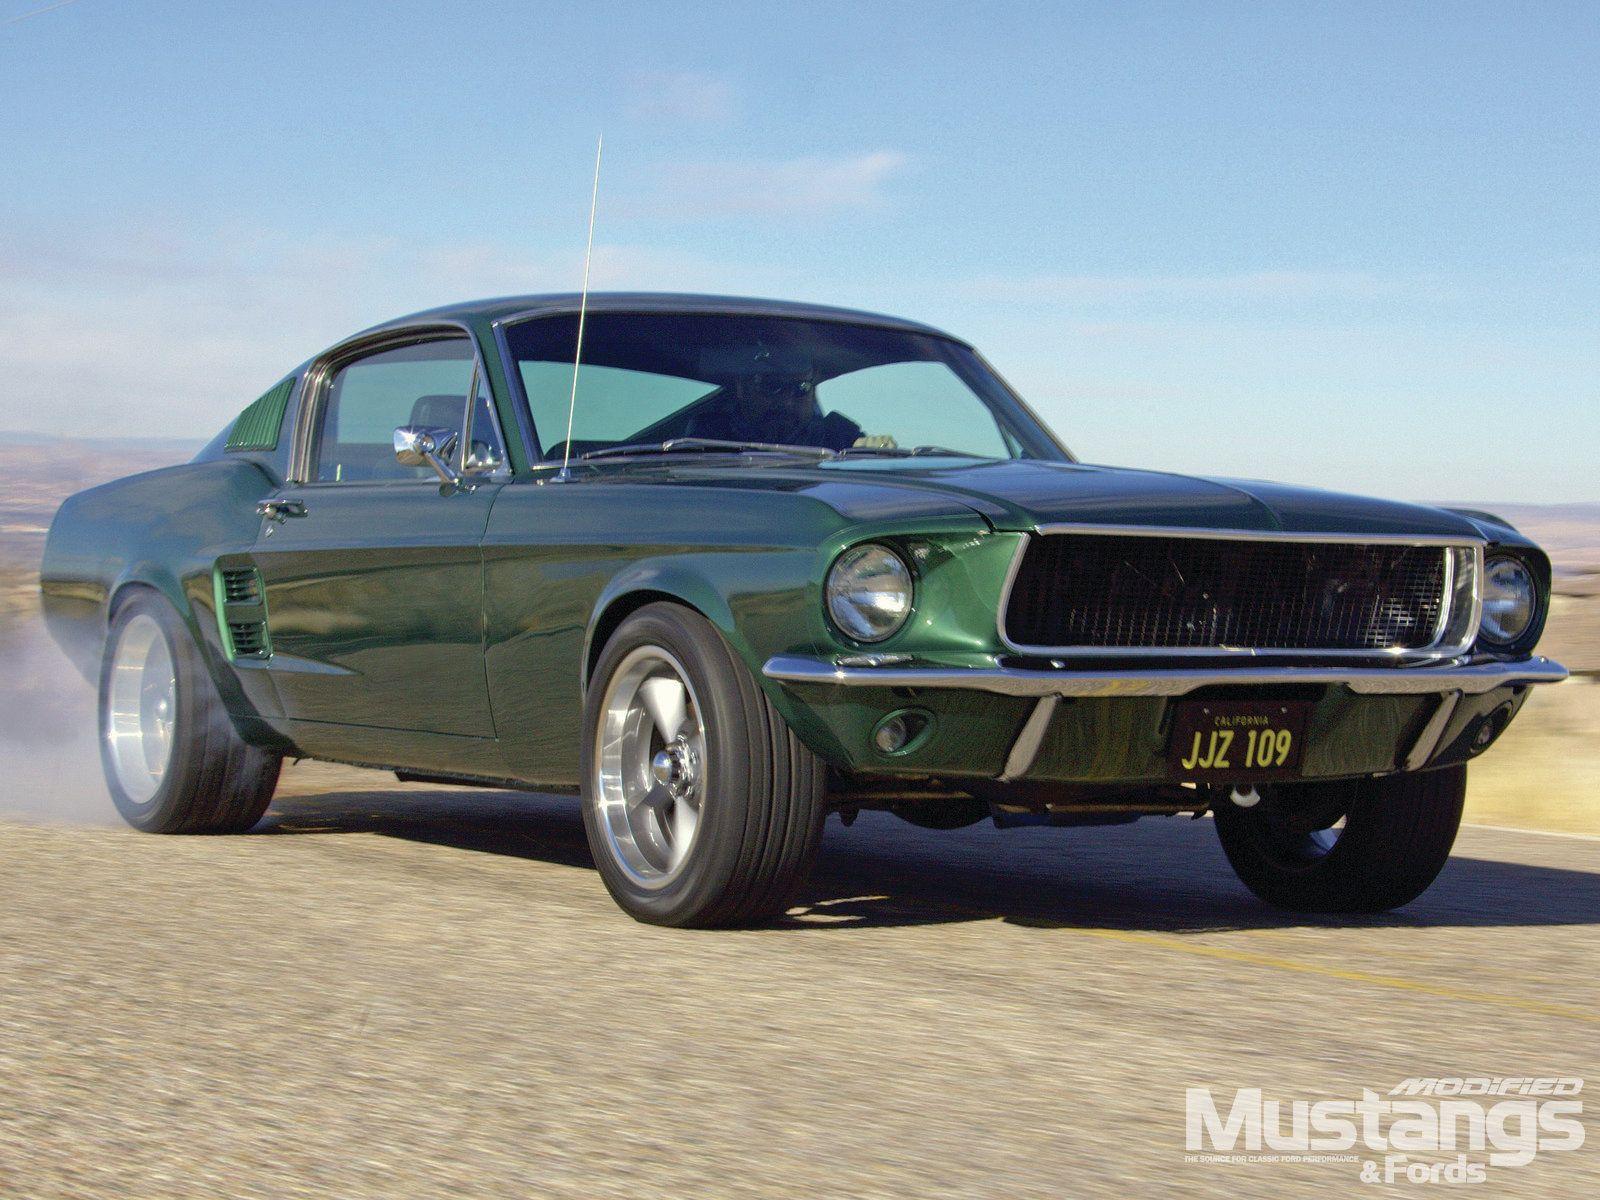 1967 Ford Mustang Bullitt Mustang Bullitt Ford Mustang Shelby Cobra 1967 Mustang